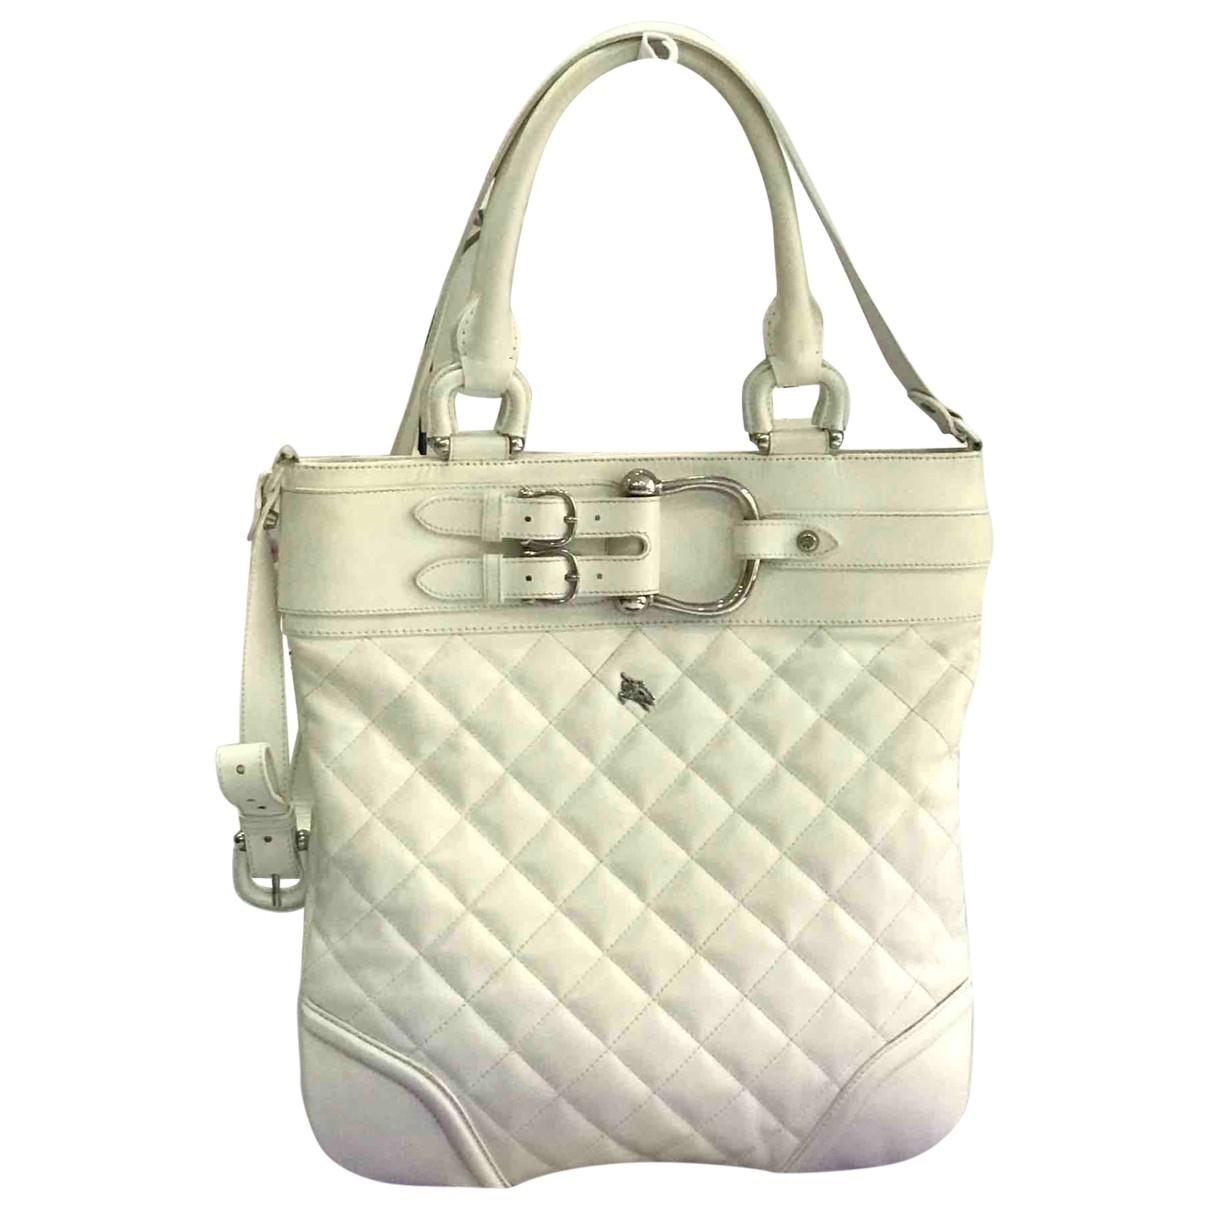 Burberry \N Handtasche in  Weiss Leder